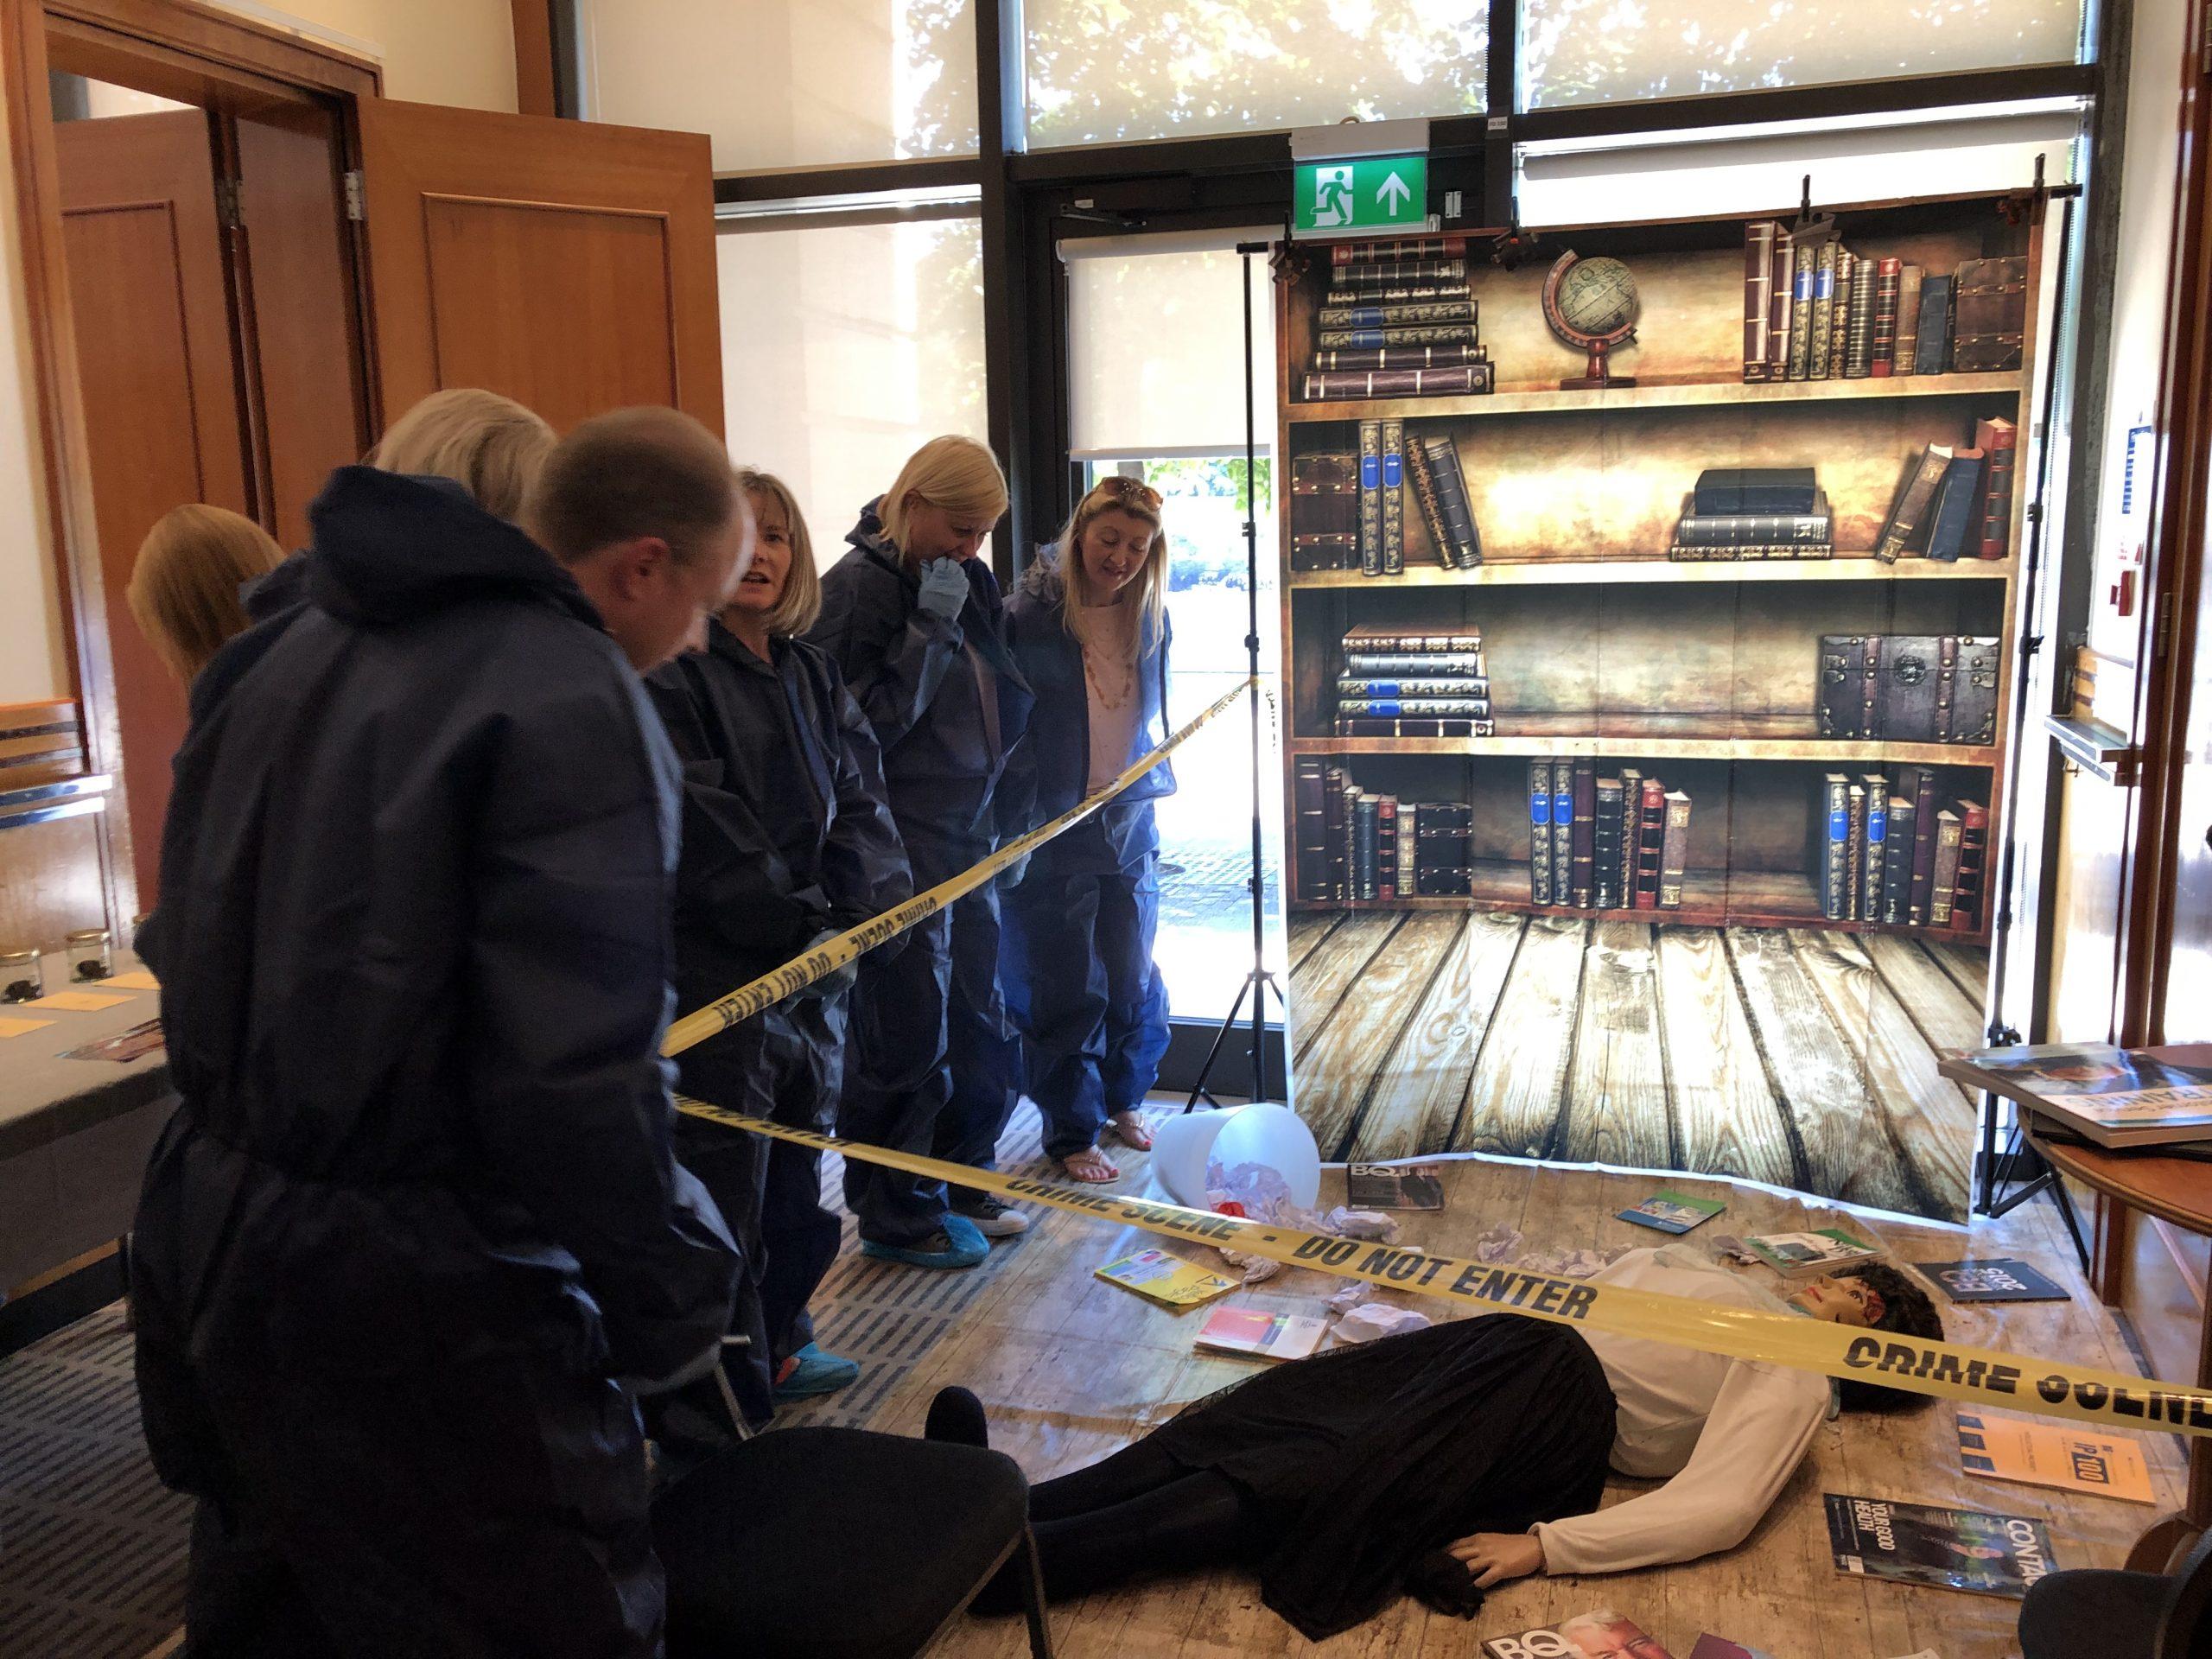 CSI Training and Events - Delegates examining a crime scene at a CSI team building event